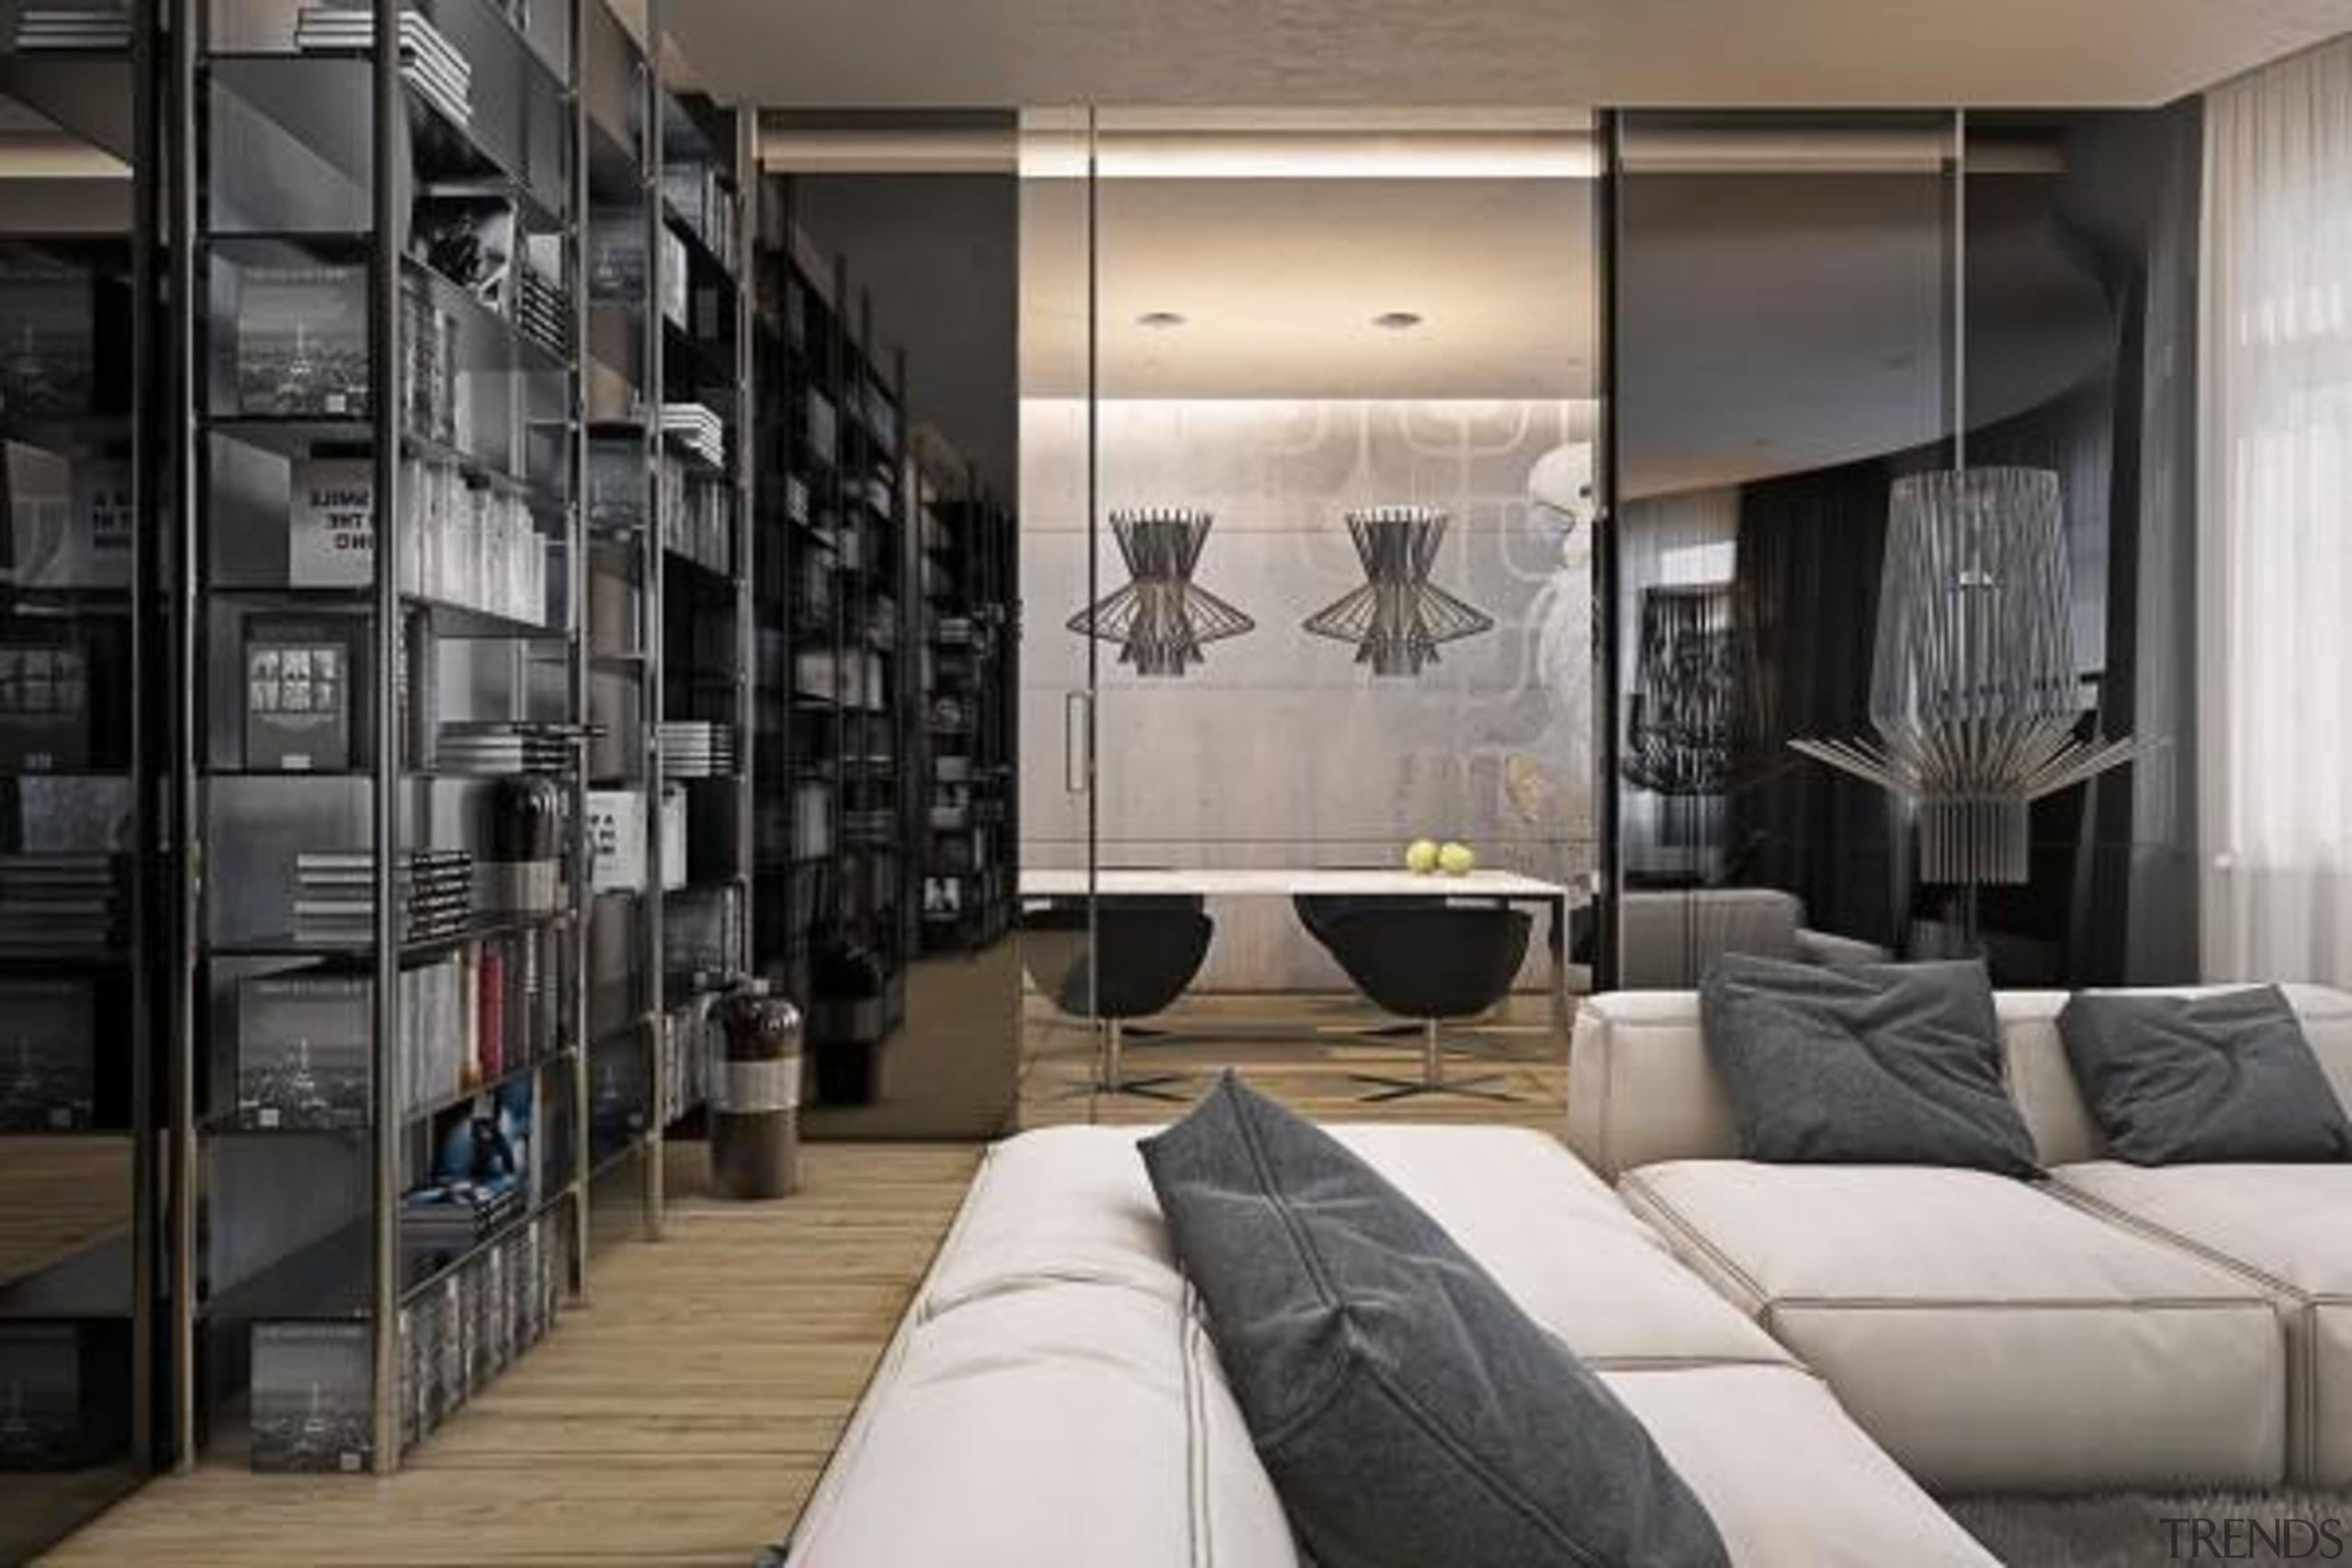 soft cream sofas - Masculine Apartments - furniture furniture, interior design, living room, room, wall, gray, black